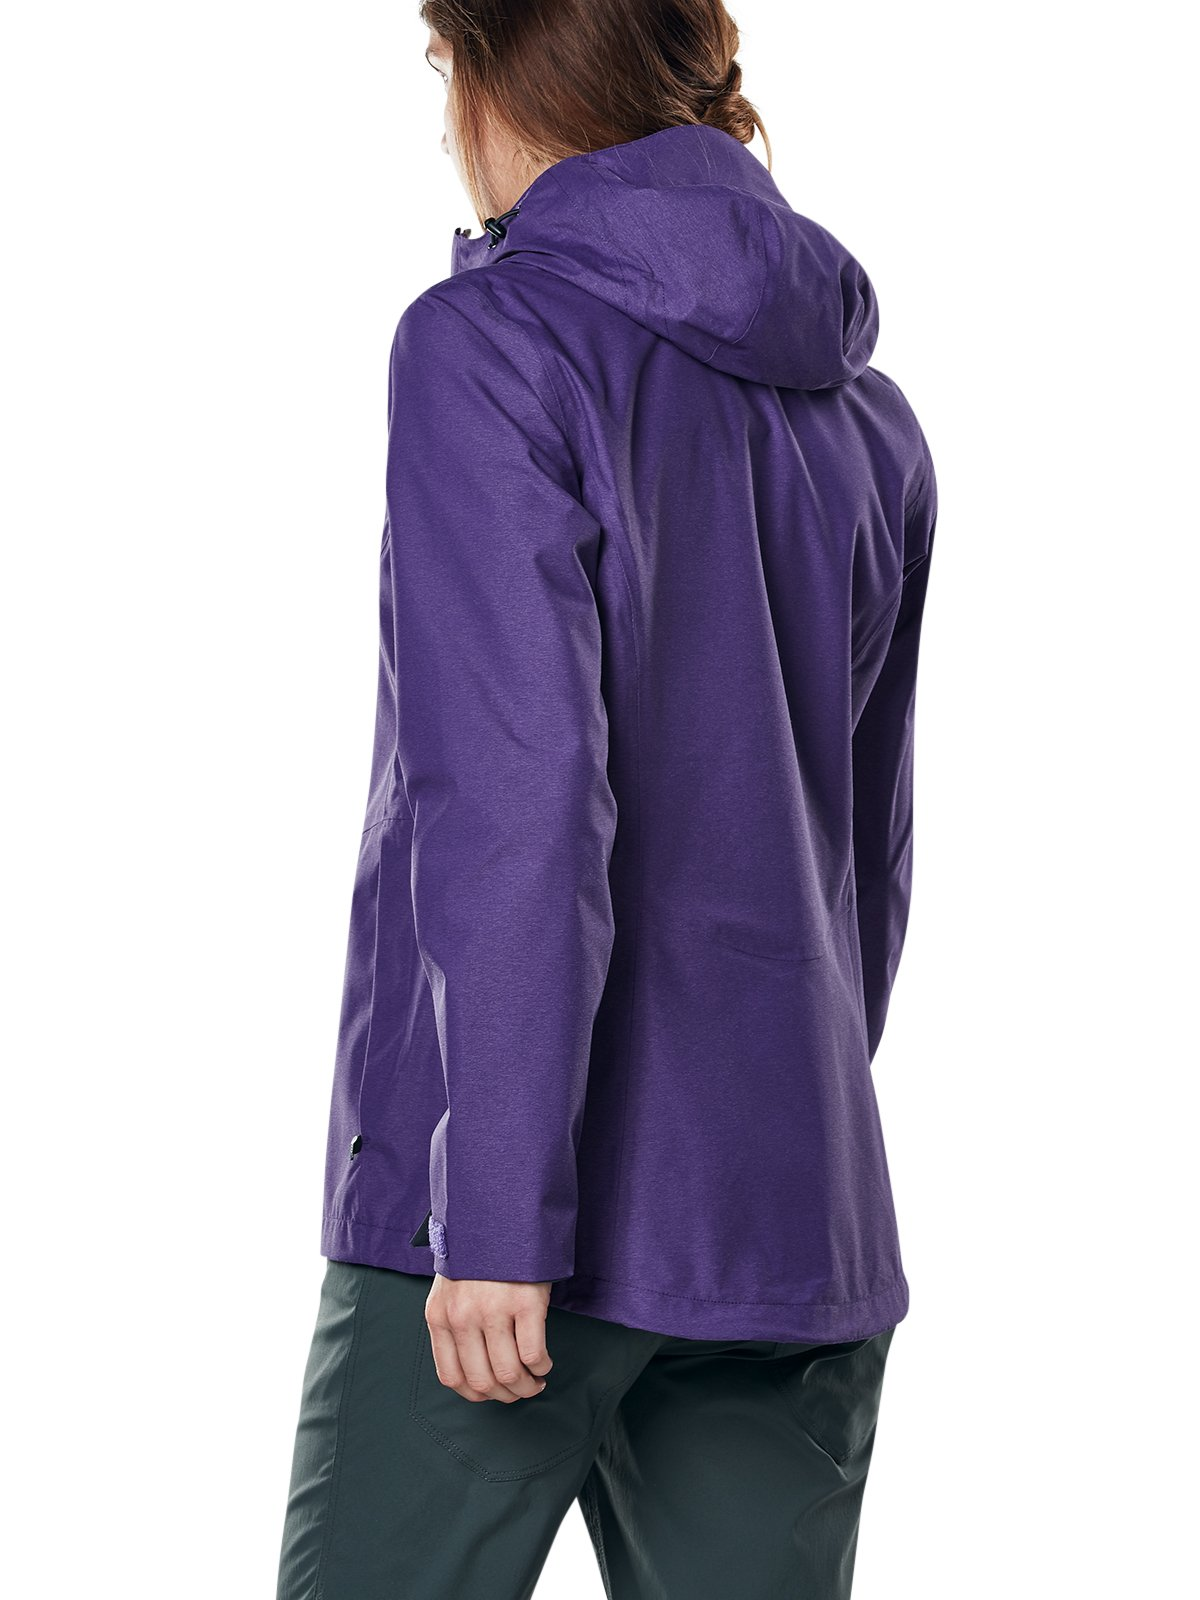 71DDj95LOAL - Berghaus Women's Elara Waterproof Jacket